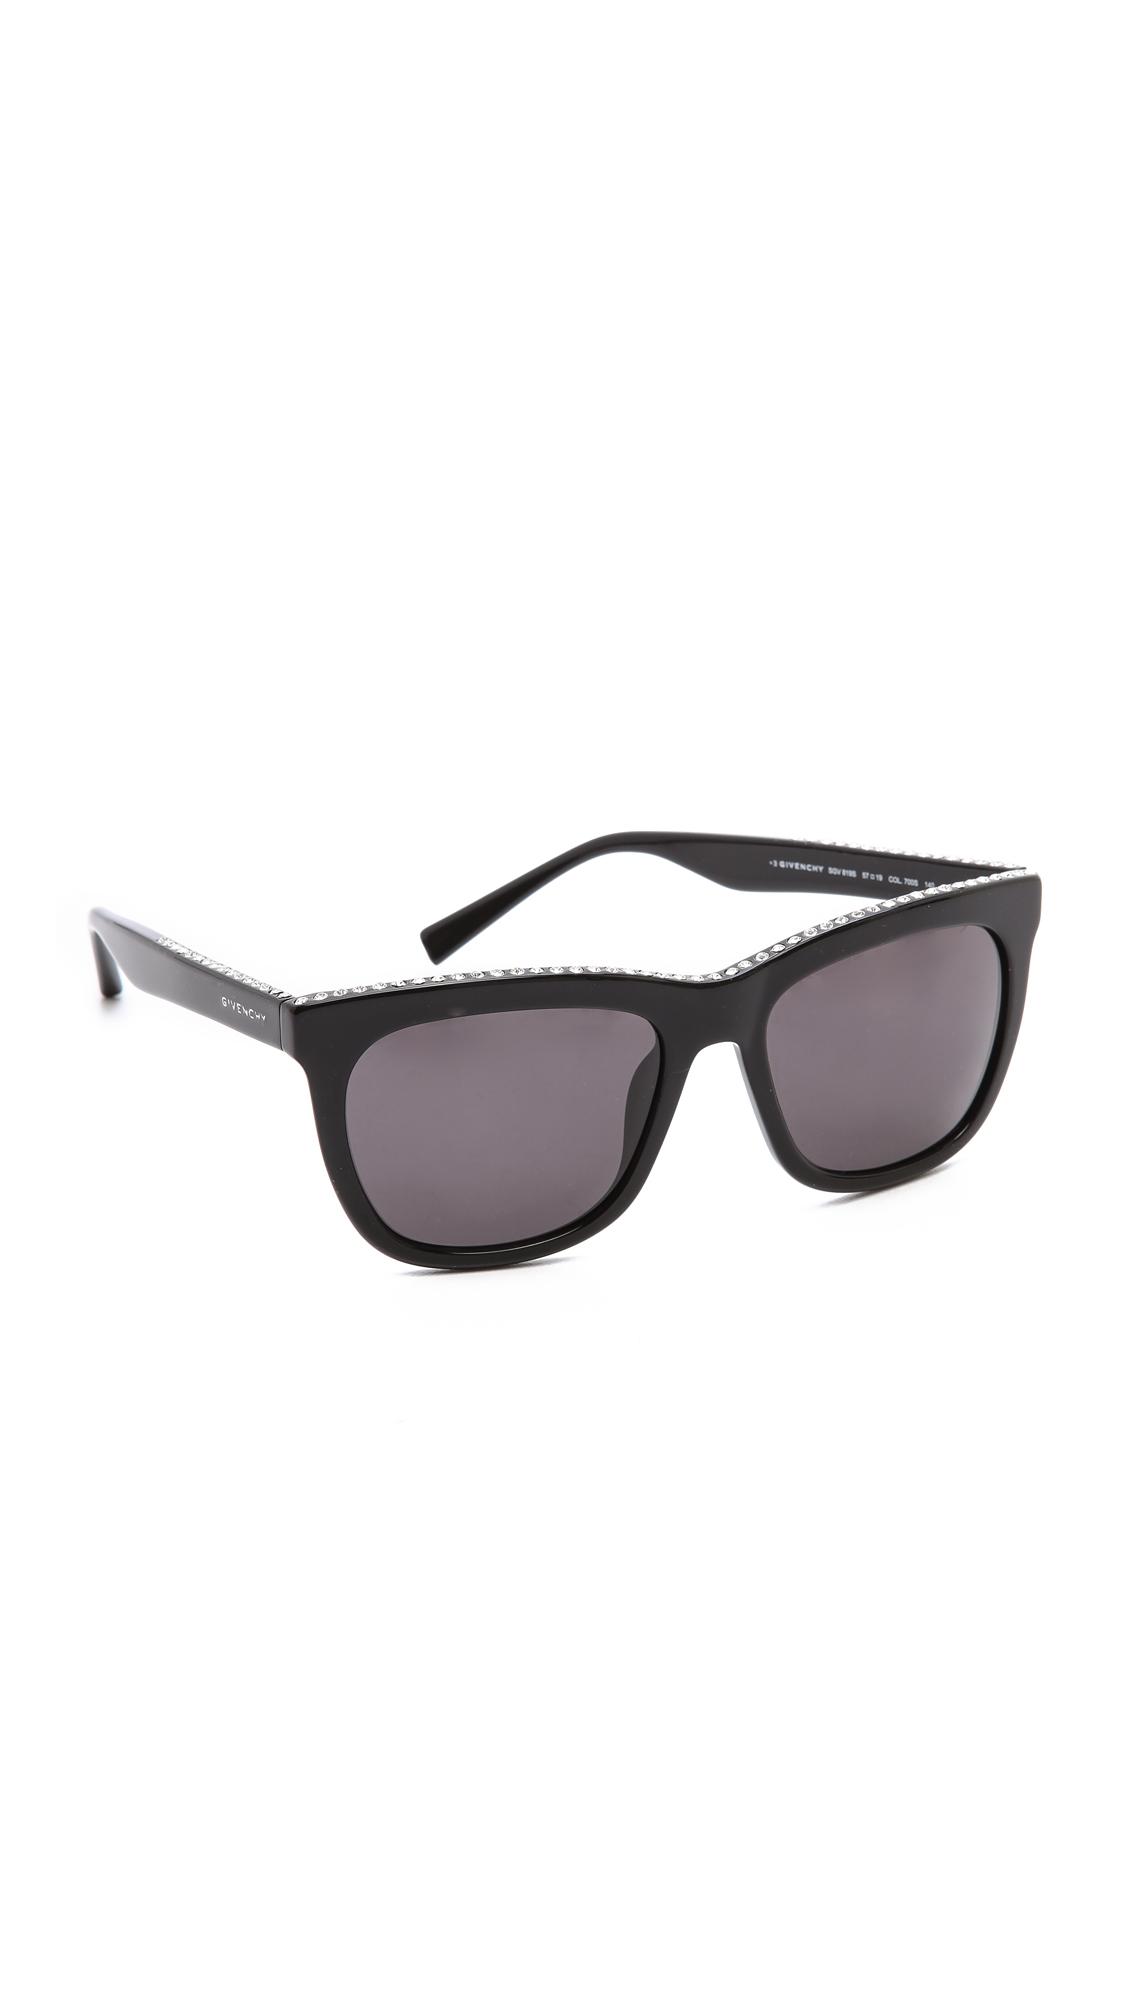 a110e2a9b1 Lyst - Givenchy Swarovski Crystal Rim Sunglasses Blacksmoke in Black